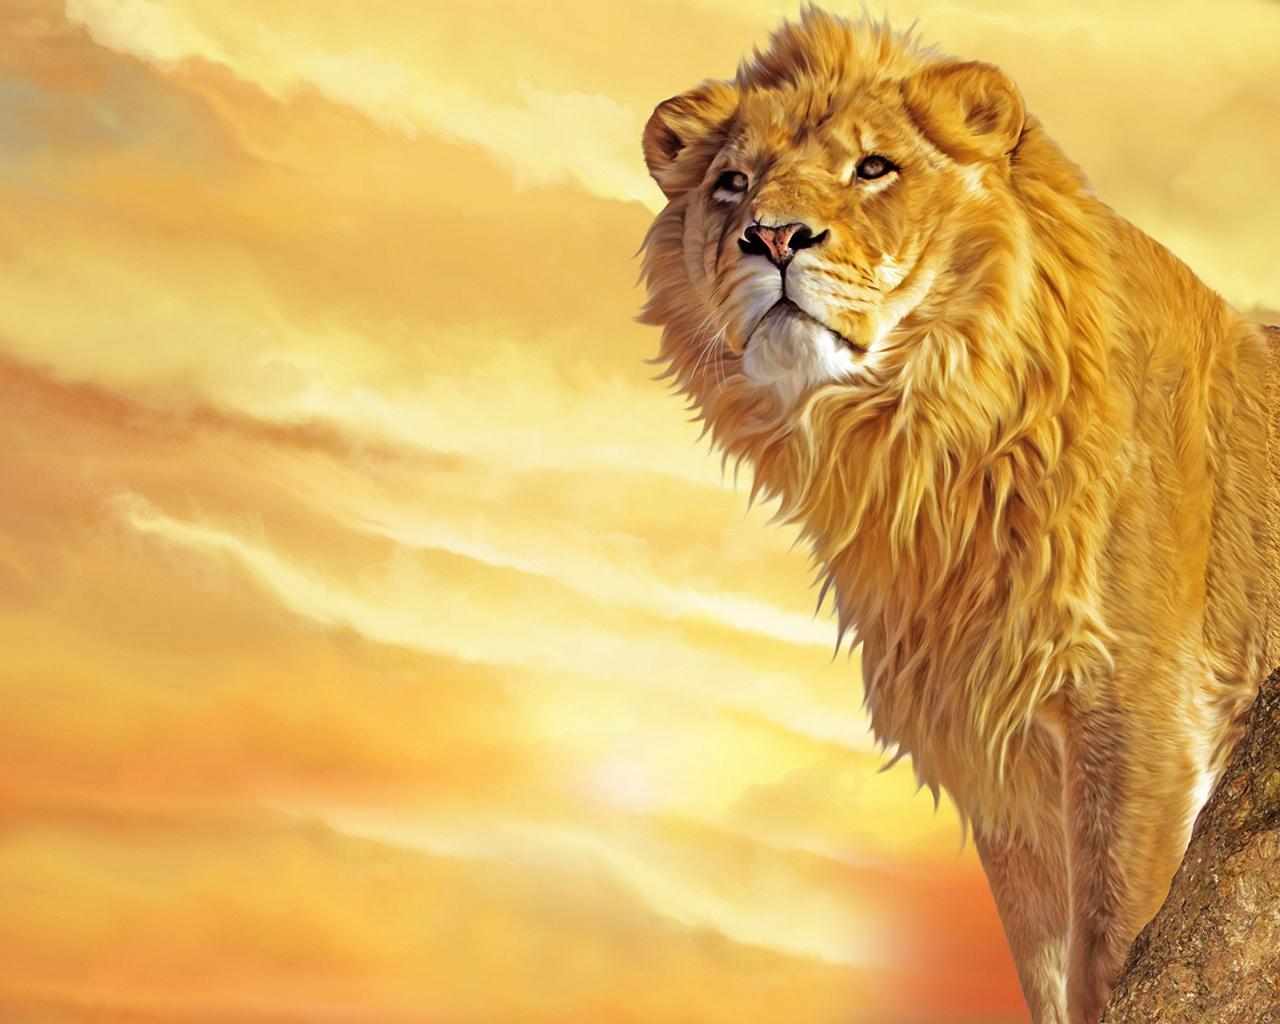 76 Lion Desktop Backgrounds On Wallpapersafari